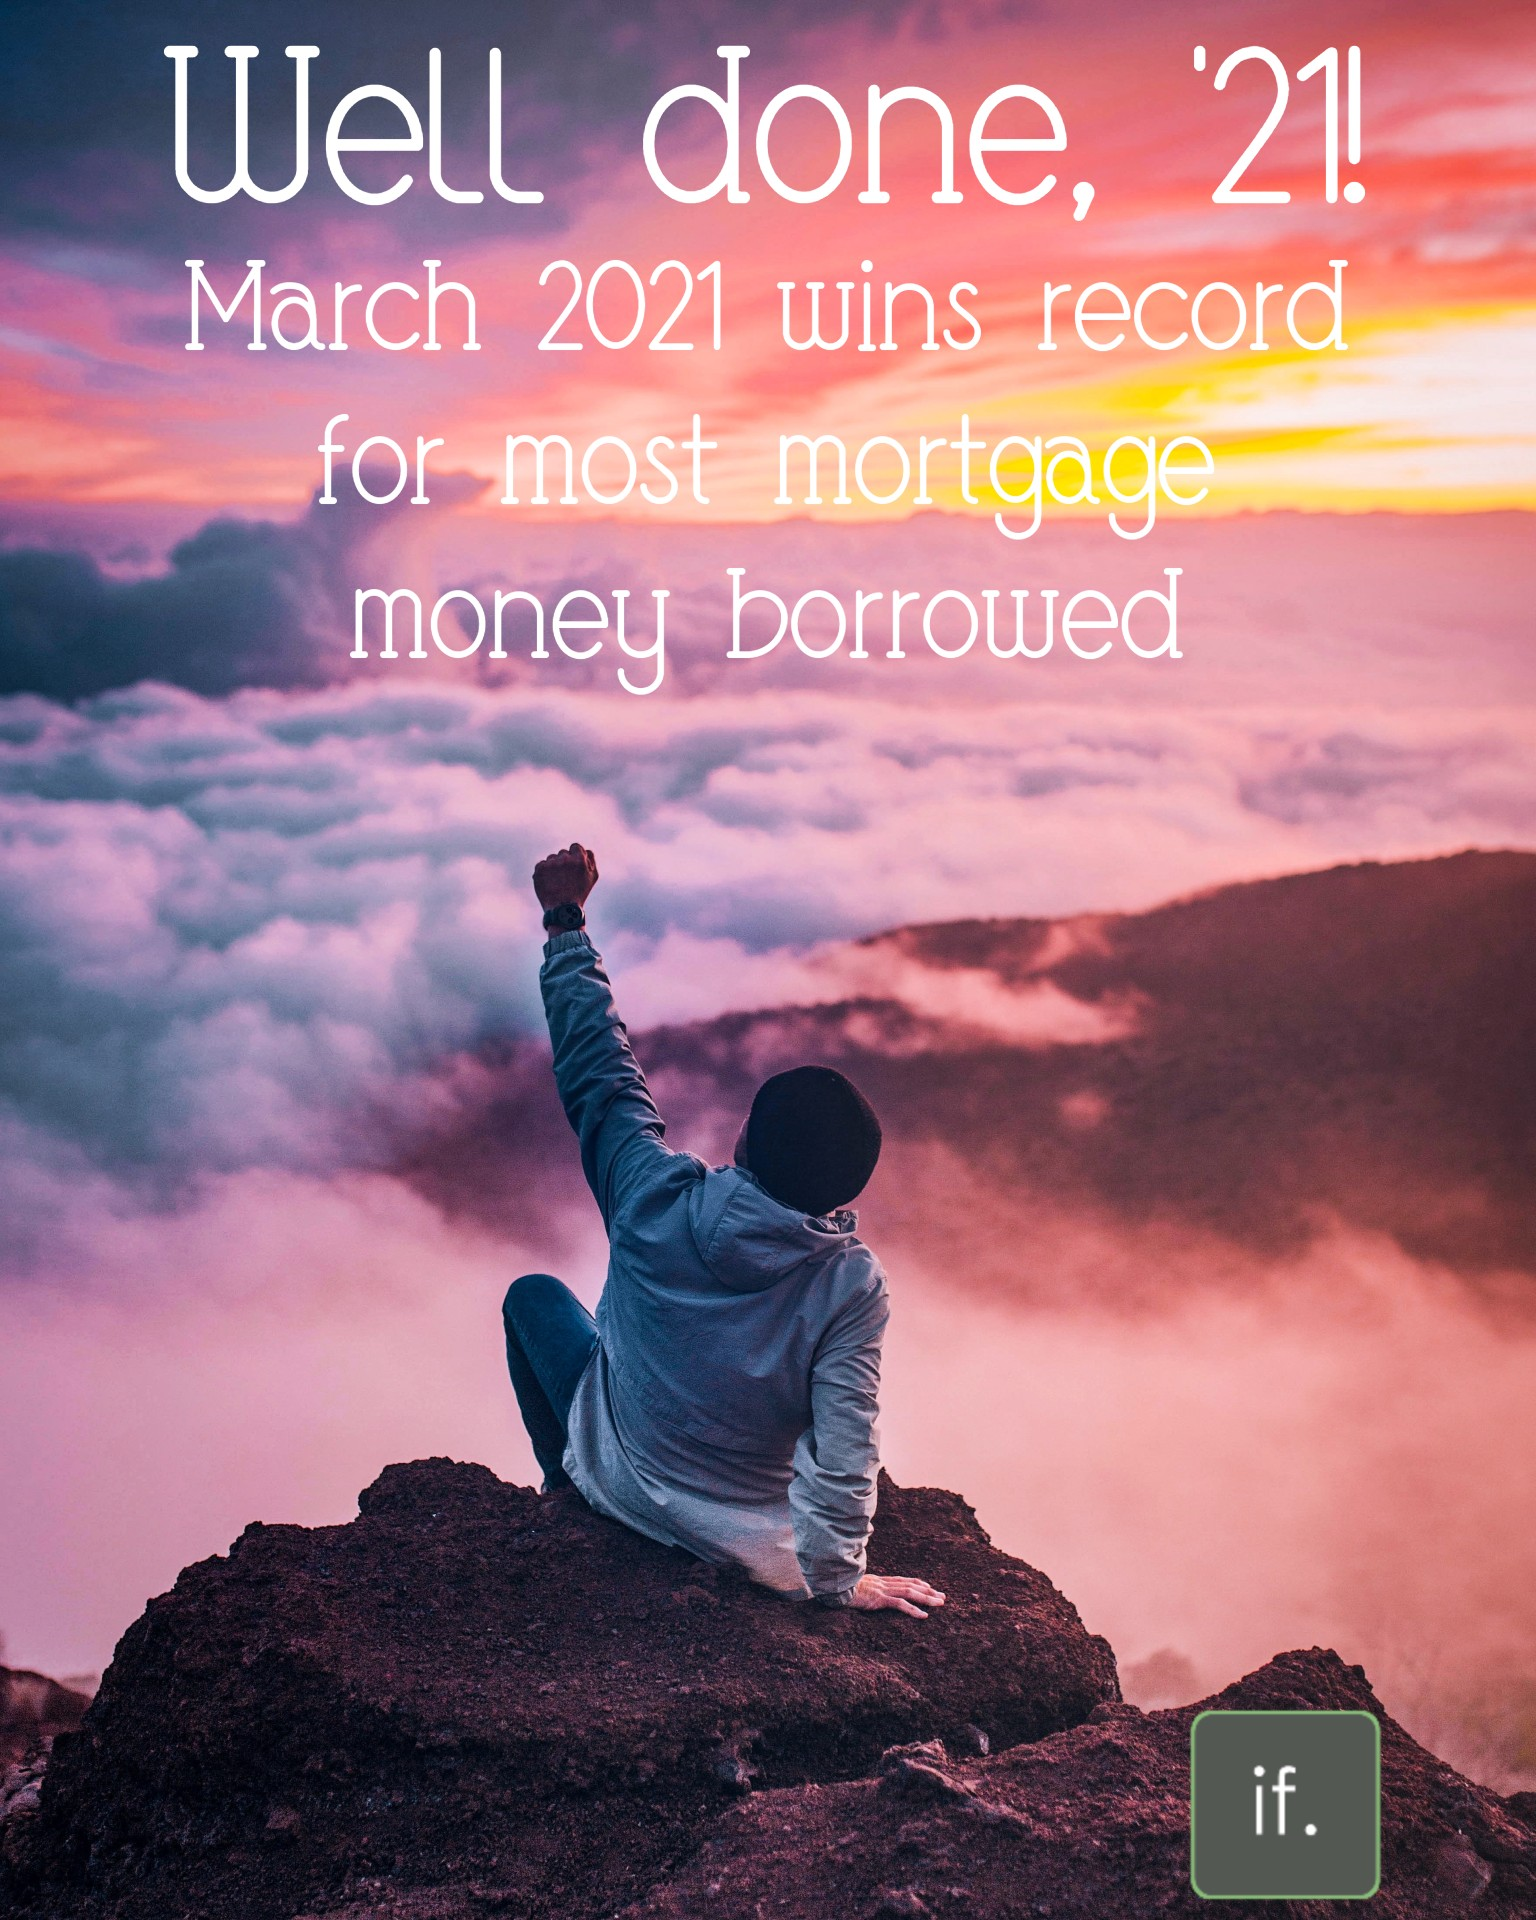 2021 Breaking Records in Housing Industry!